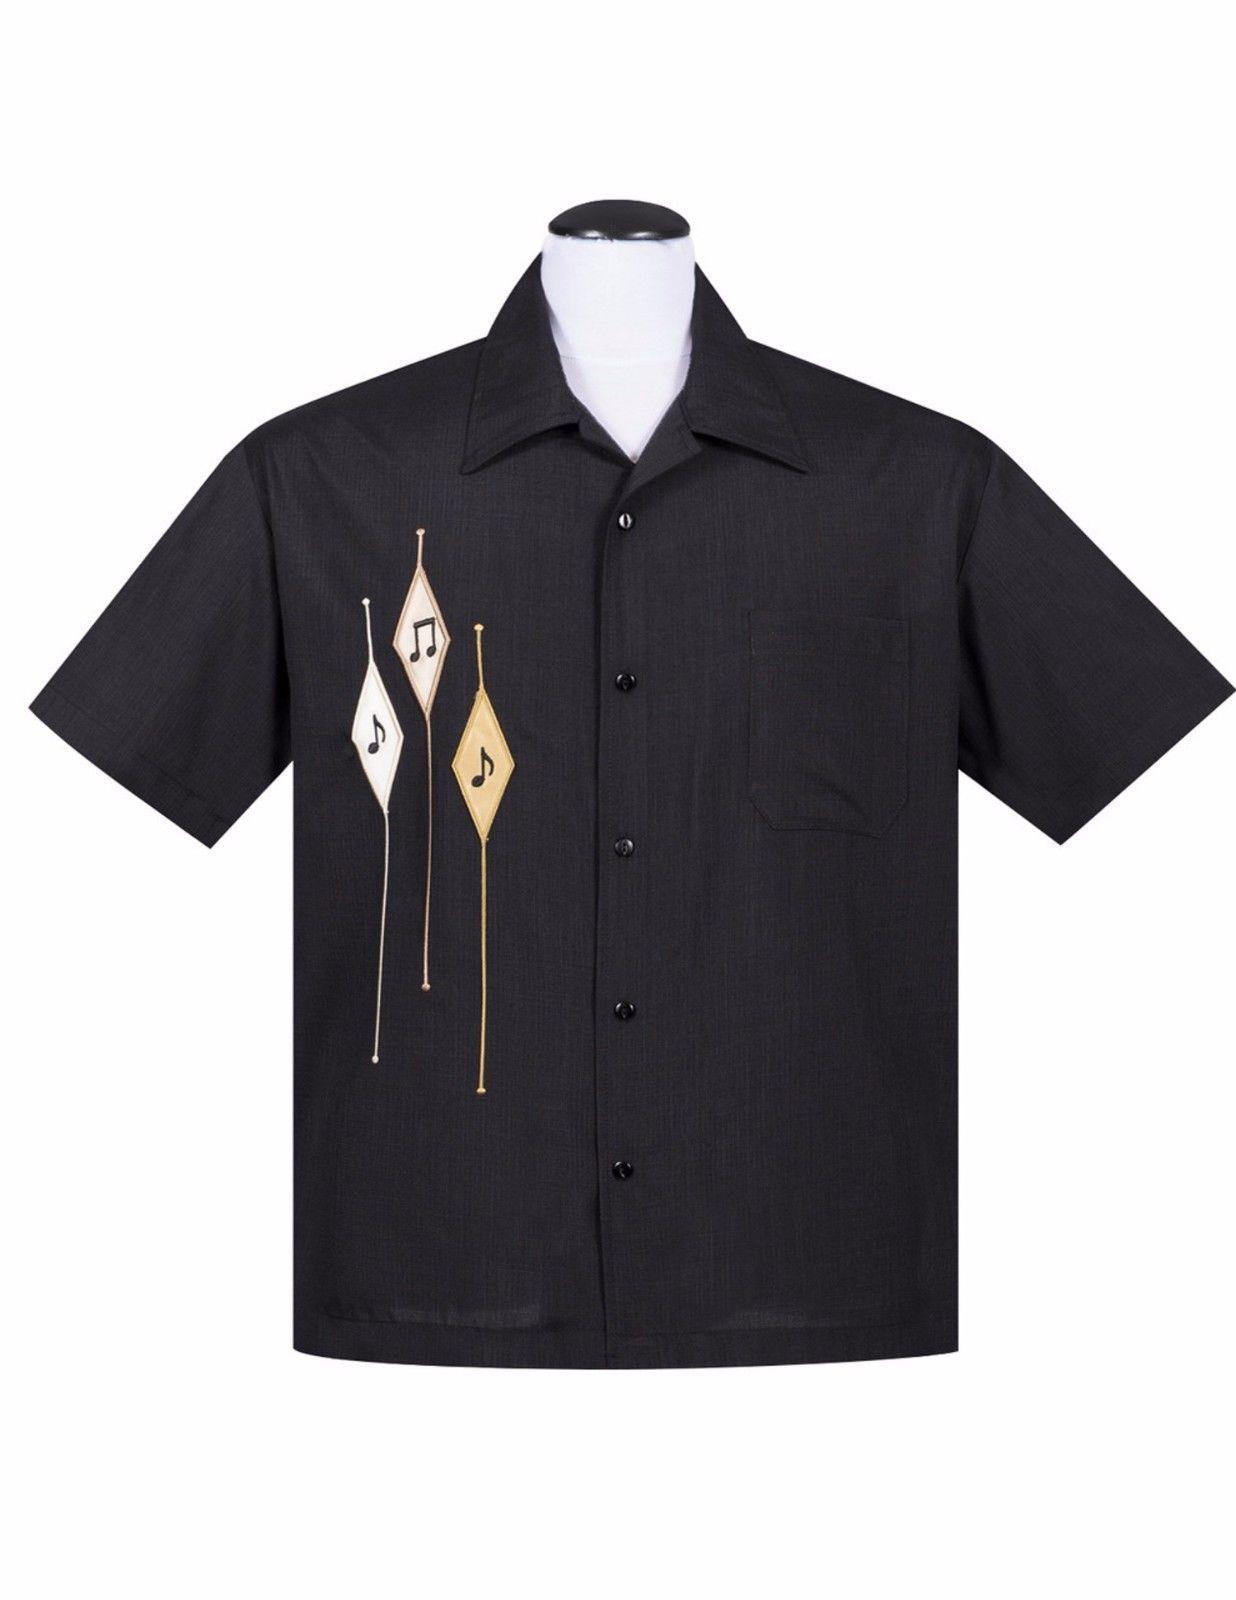 Steady Clothing Diamond Music Note Black Men s Bowling Shirt Rockabilly  Retro  a97140cf5a5d